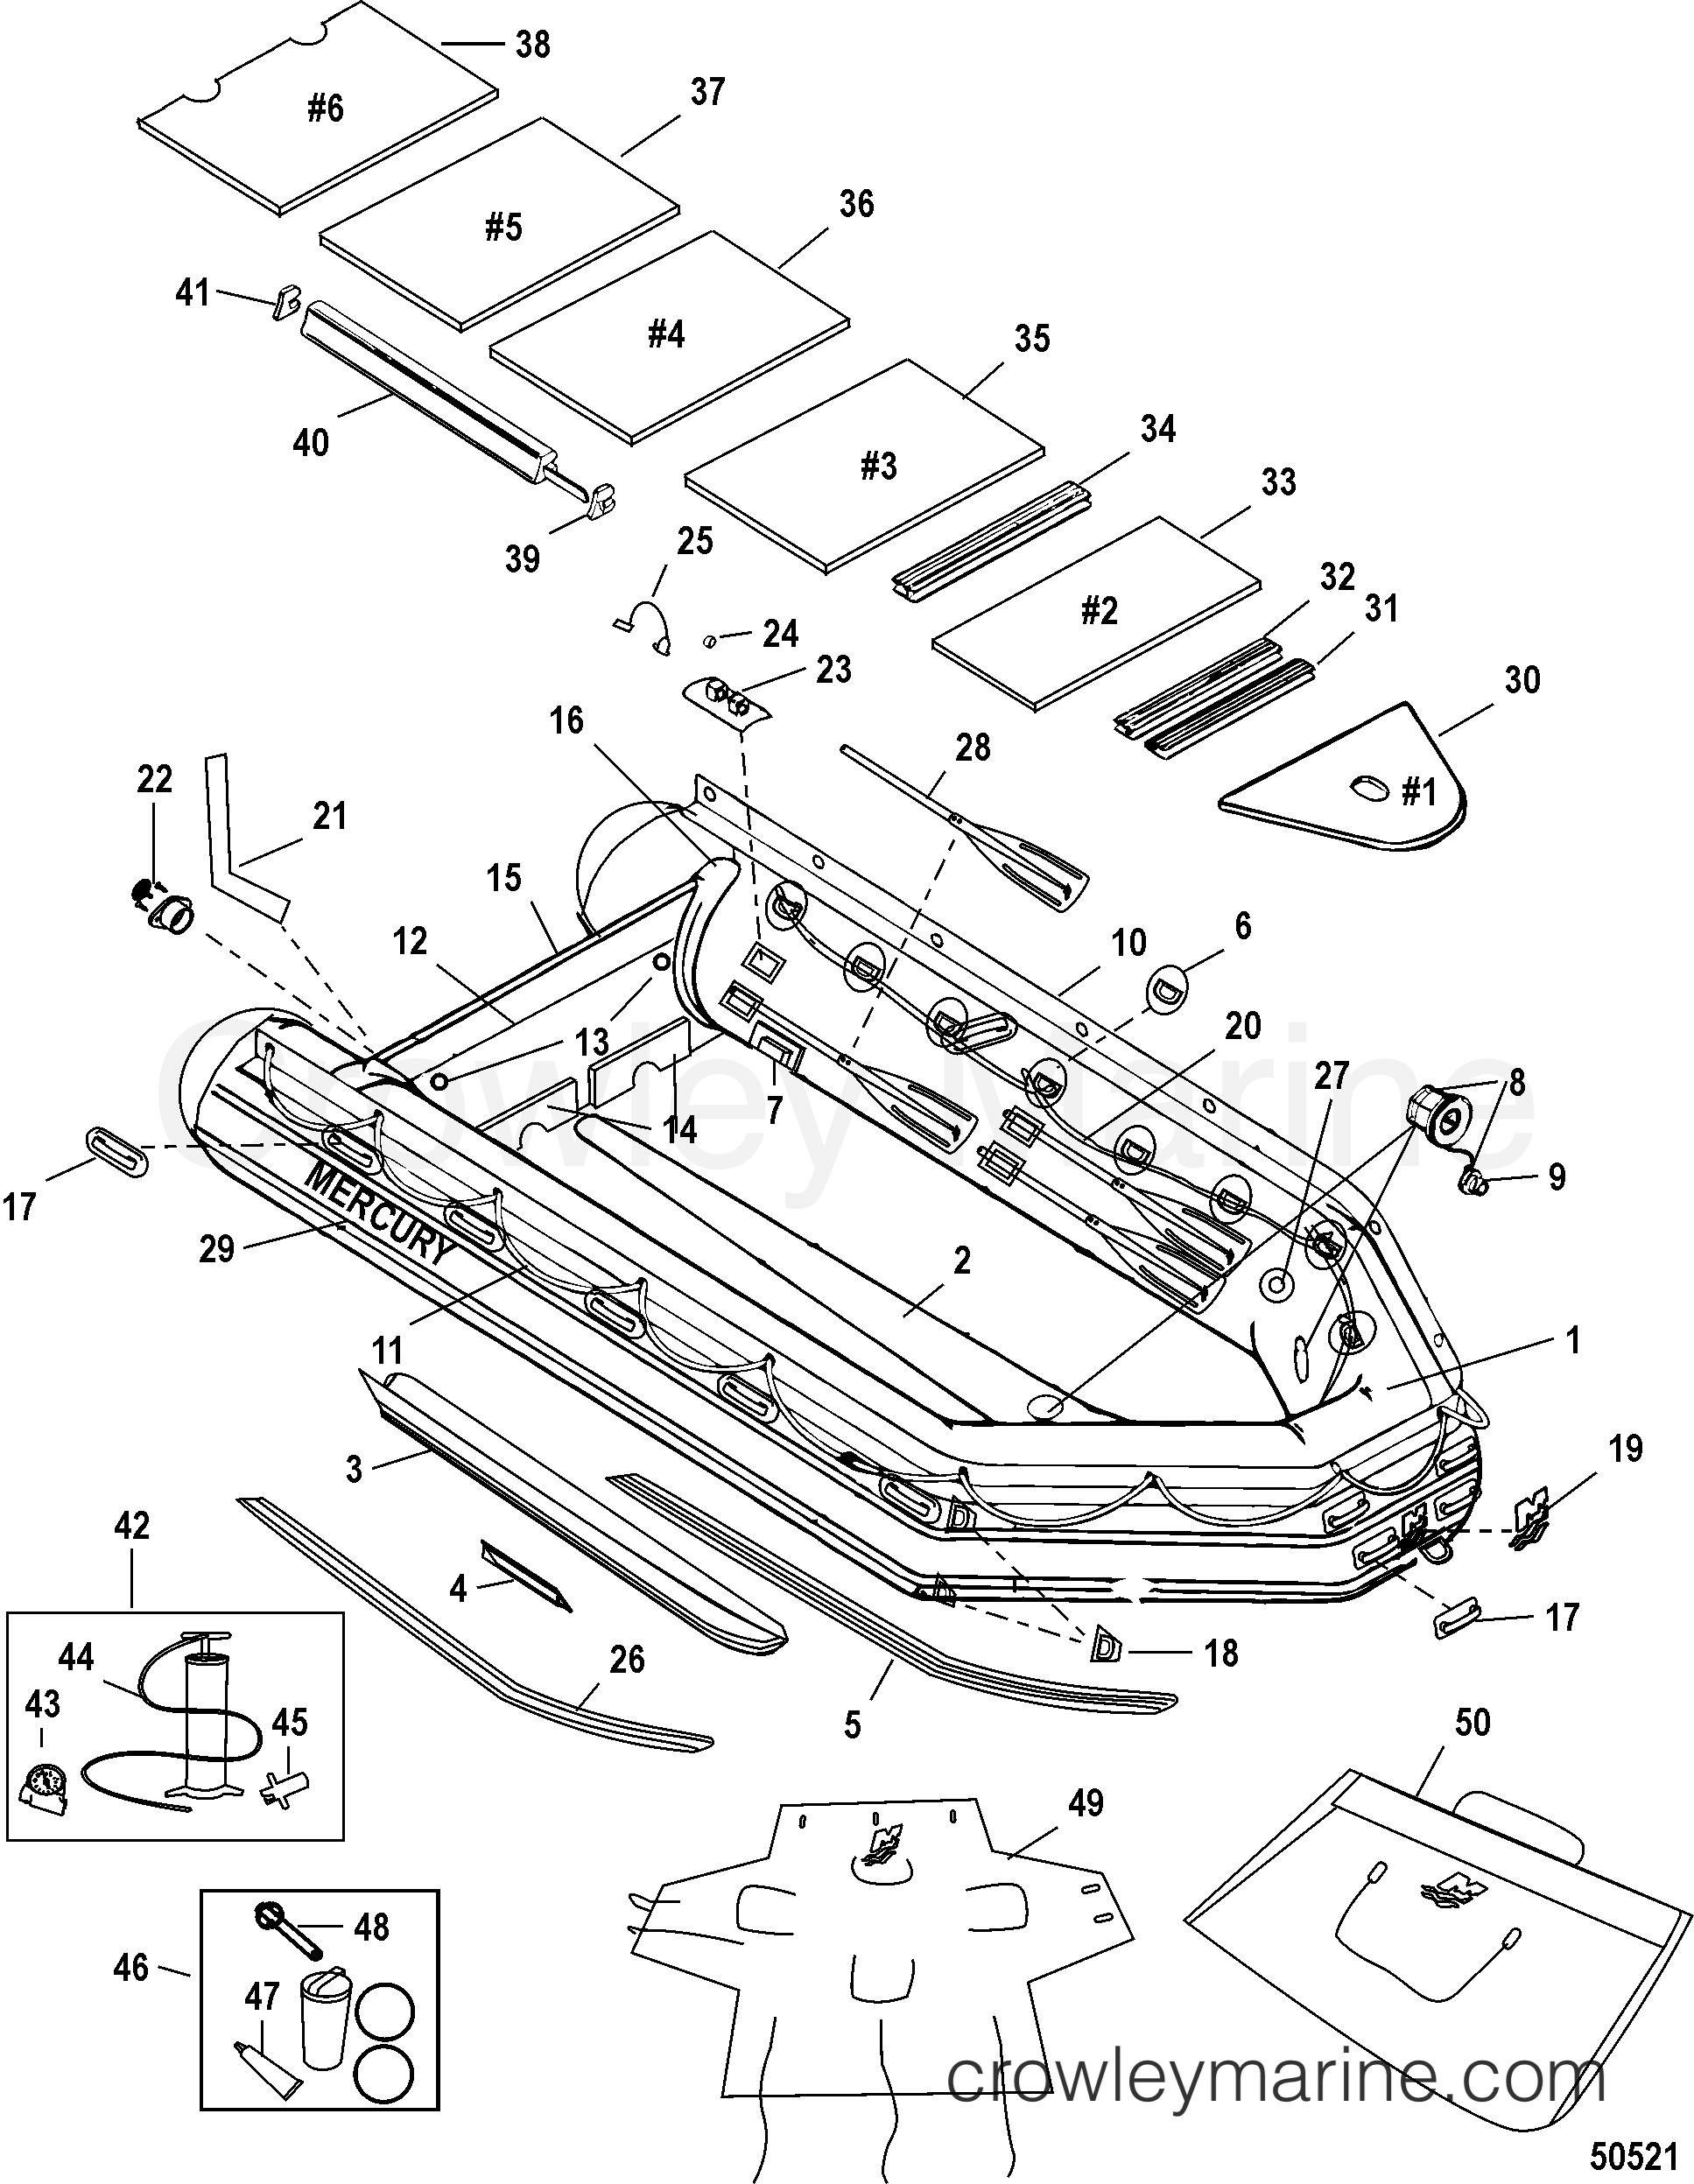 2011 Quicksilver Inflatable 270SPT [IB3] - AA270098M - TM470 PRO MODEL-PVC(BLACK- ALUMINUM FLOORS) section